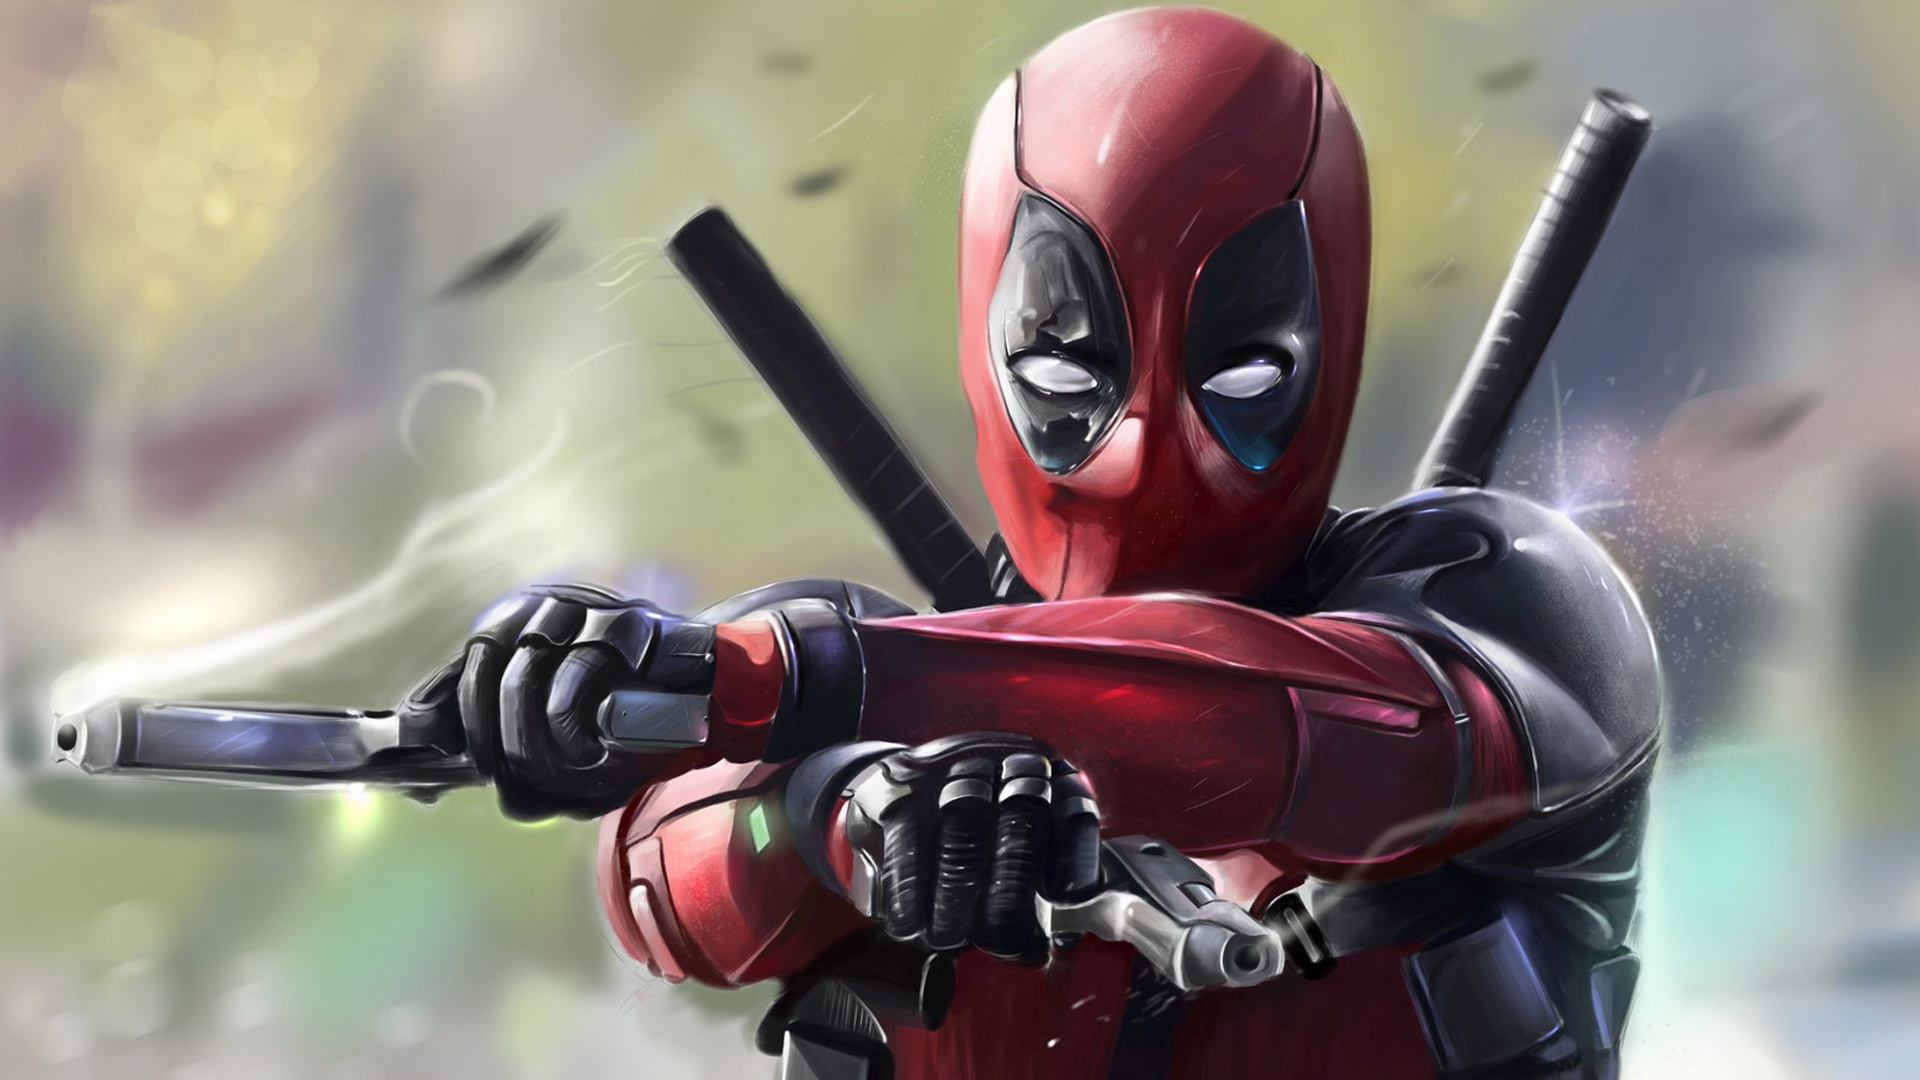 Deadpool movie HD Wallpapers download 1920x1080